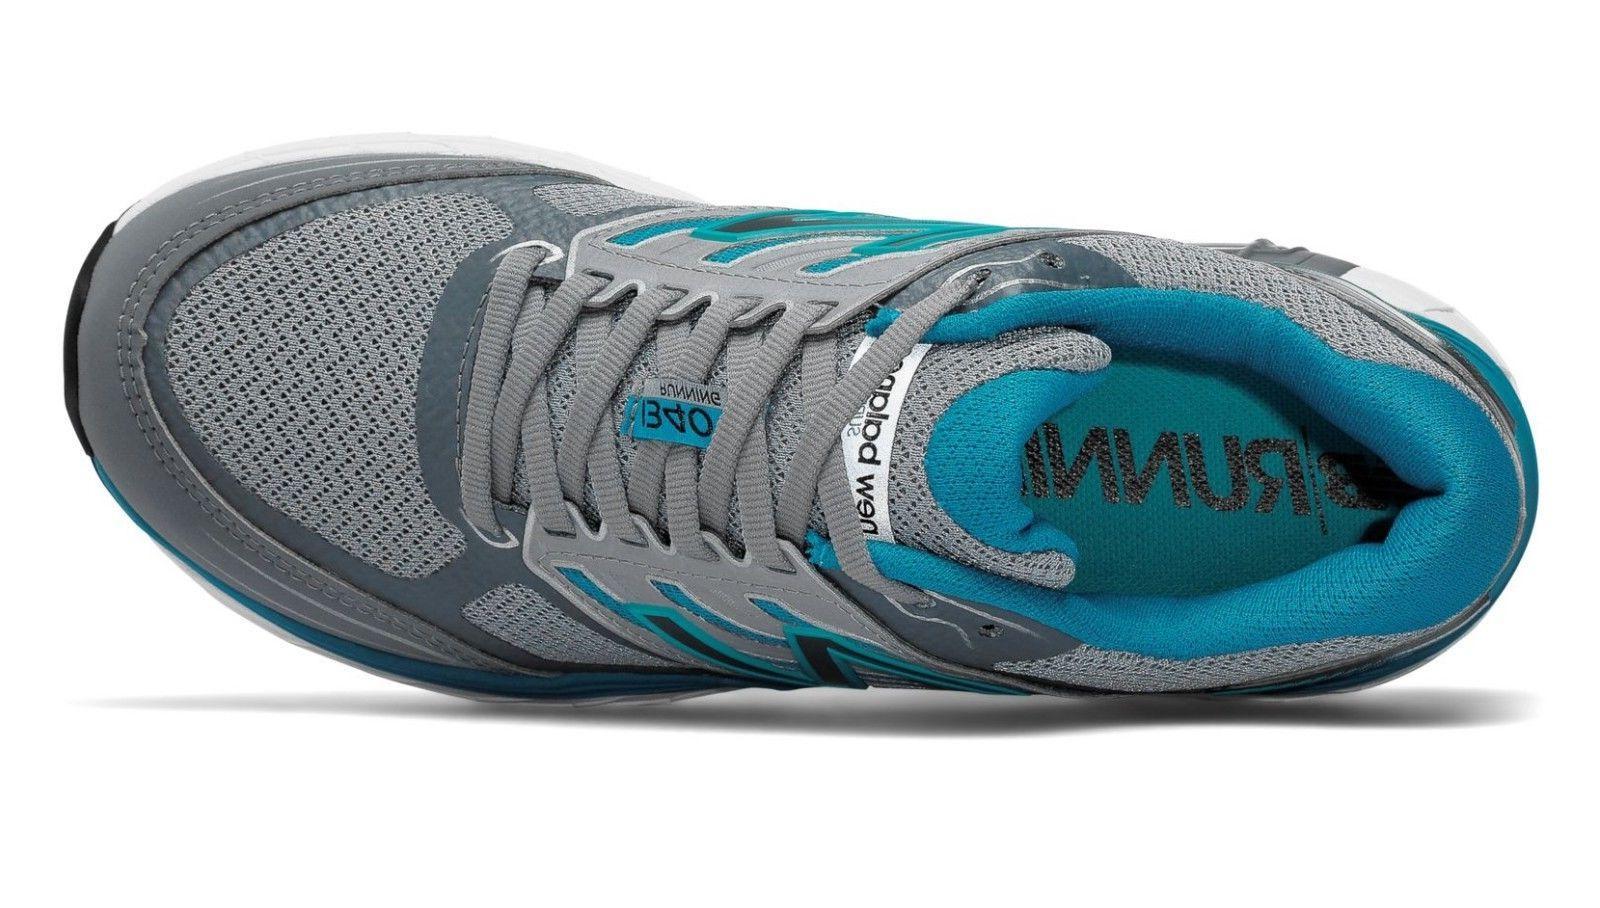 New 1340v3 Gray Sneakers